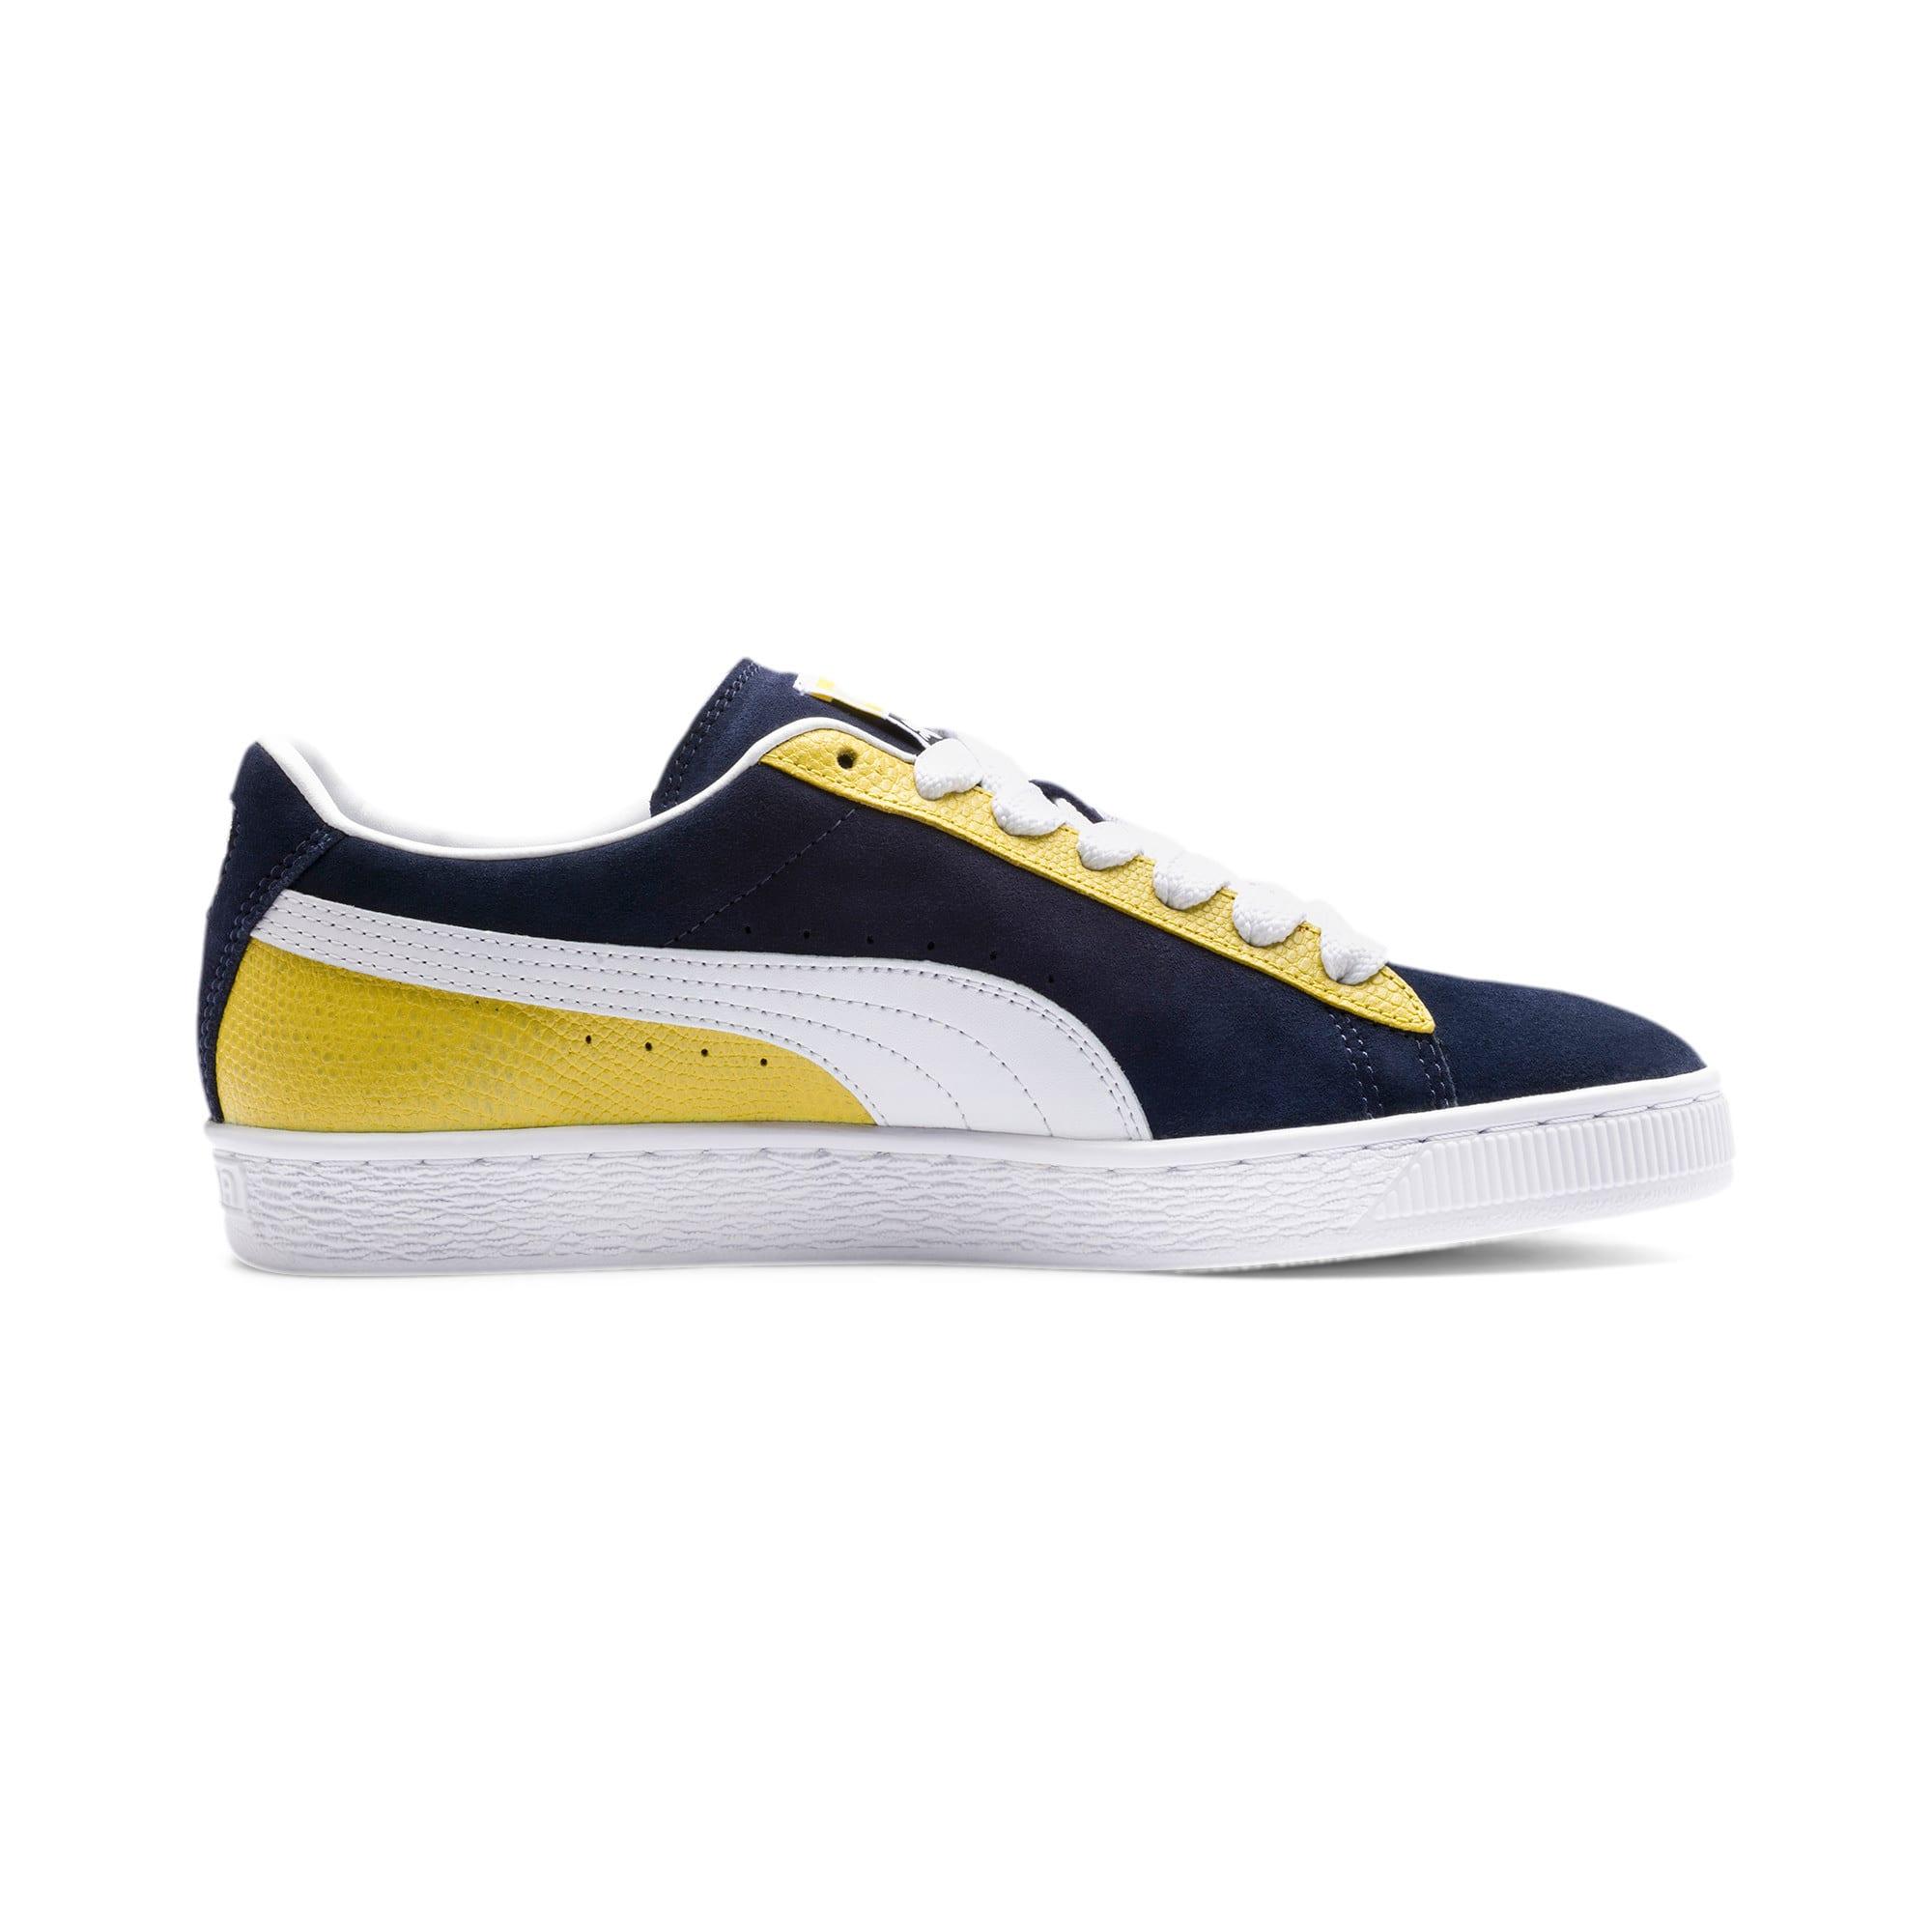 Miniatura 6 de Zapatos deportivos Suede Classic Block, Peacoat-Sulphur-Puma White, mediano